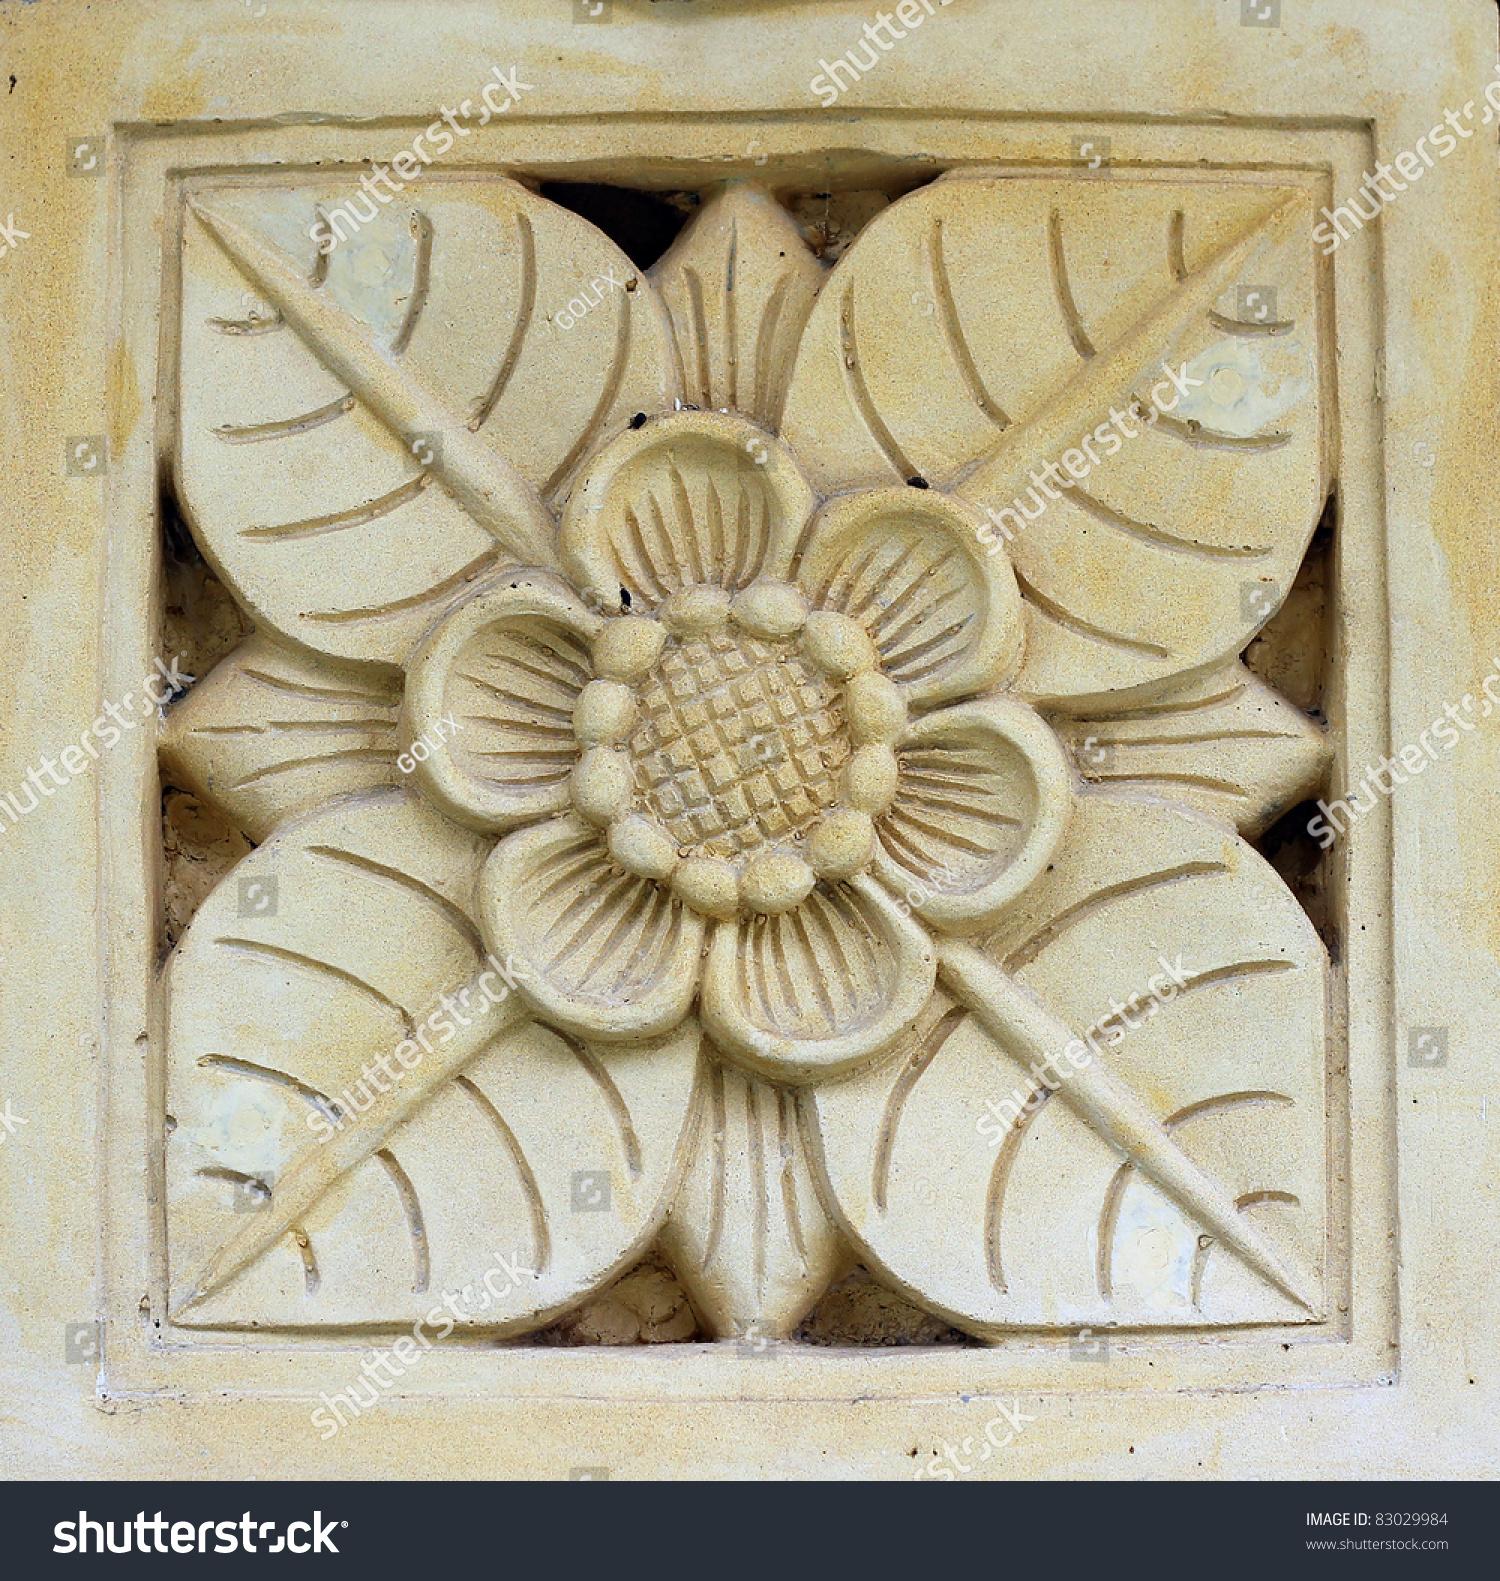 Flower stone carving stock photo shutterstock